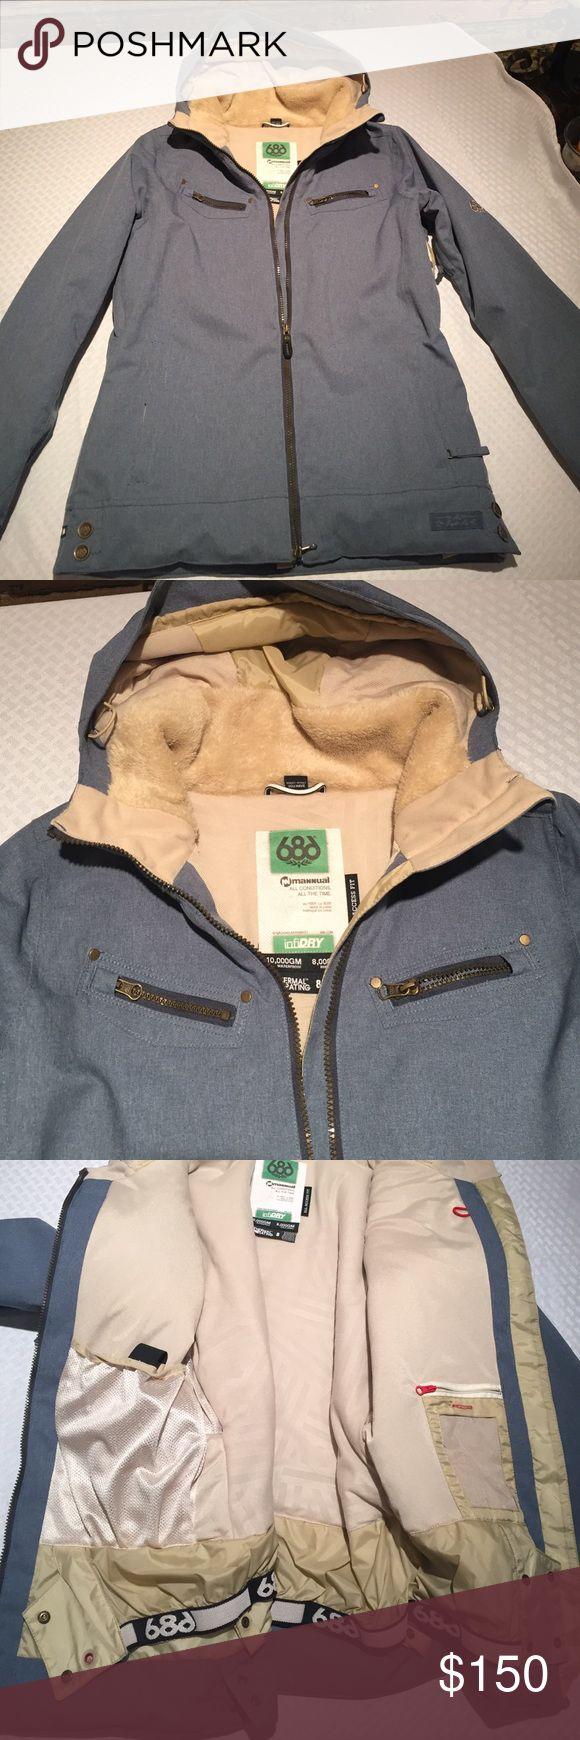 Never worn 686 snowboarding jacket Slate blue 686 snowboarding jacket, never worn Jackets & Coats Utility Jackets